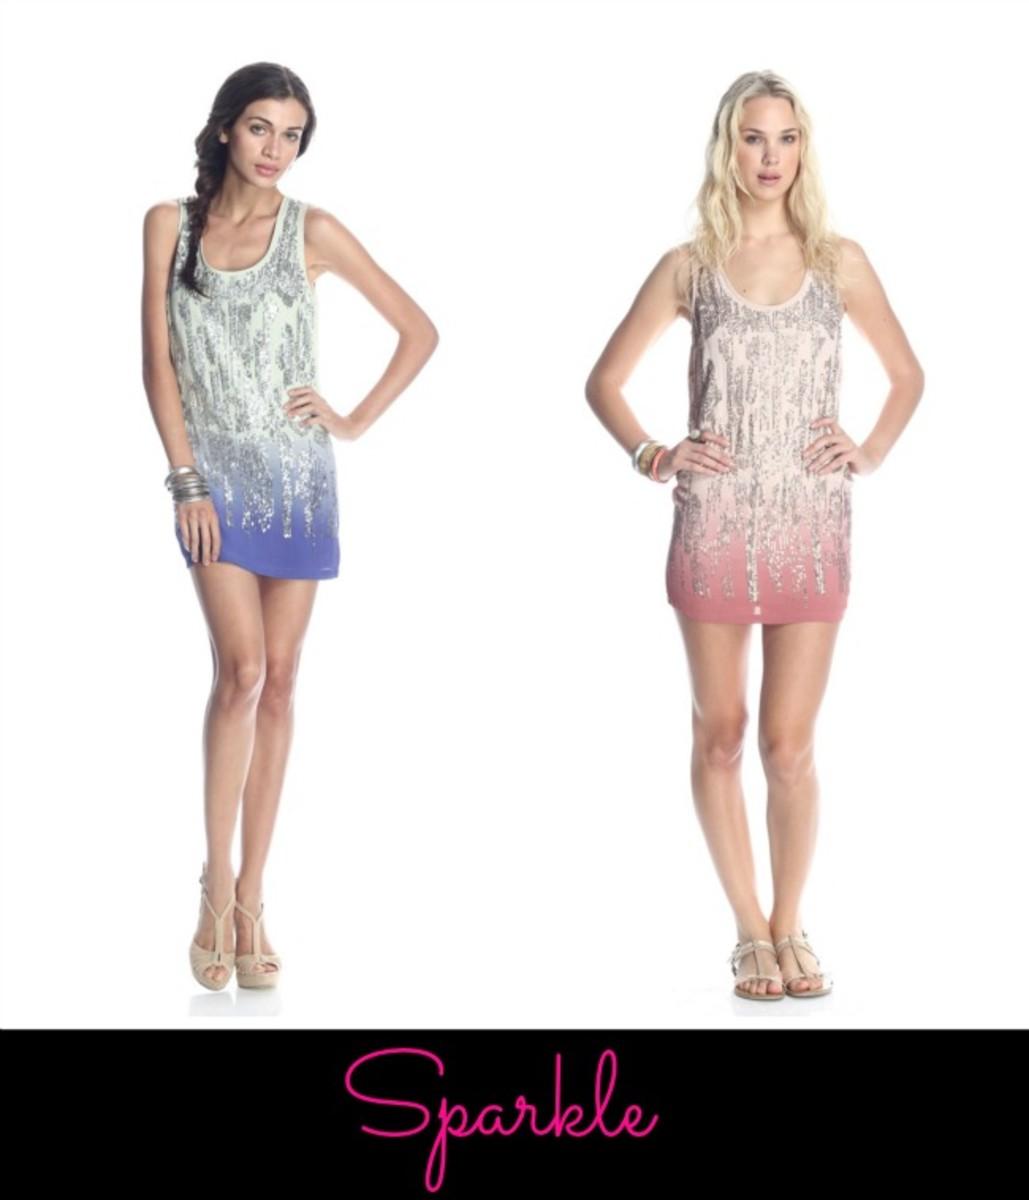 summer dresses, mini dresses, short dresses, sparkle, prints, printed dresses